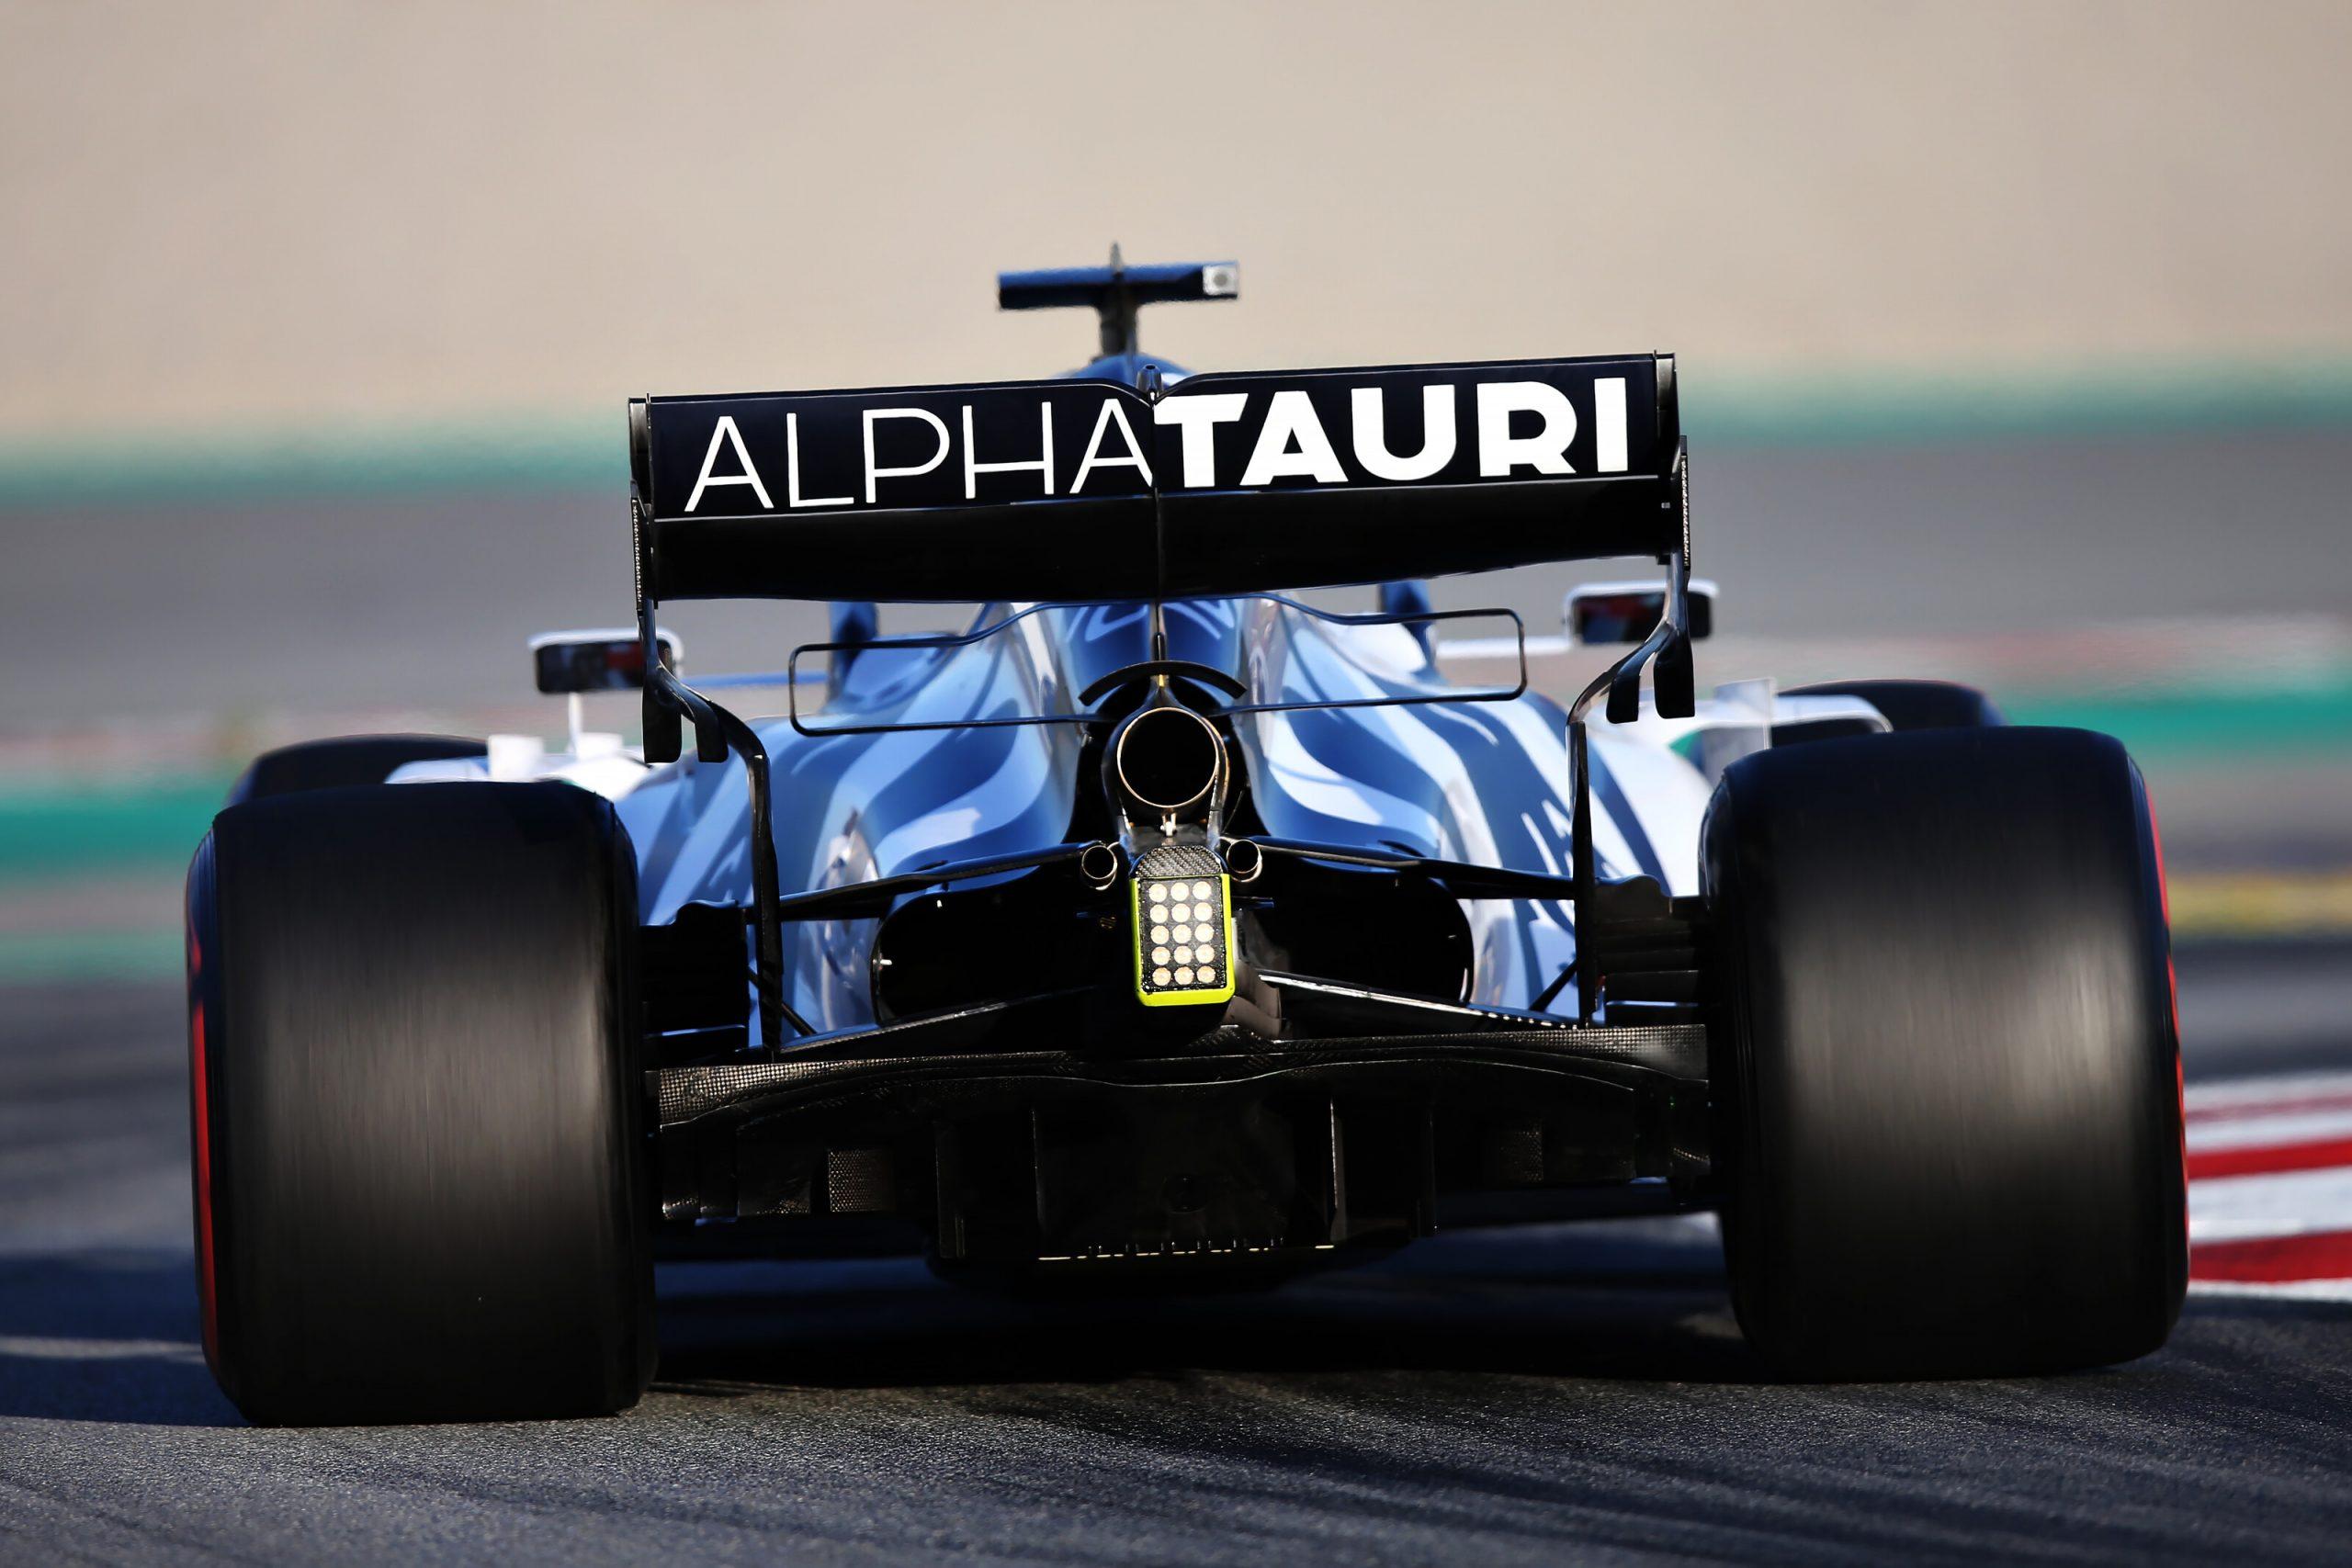 alphatauri 2020 F1